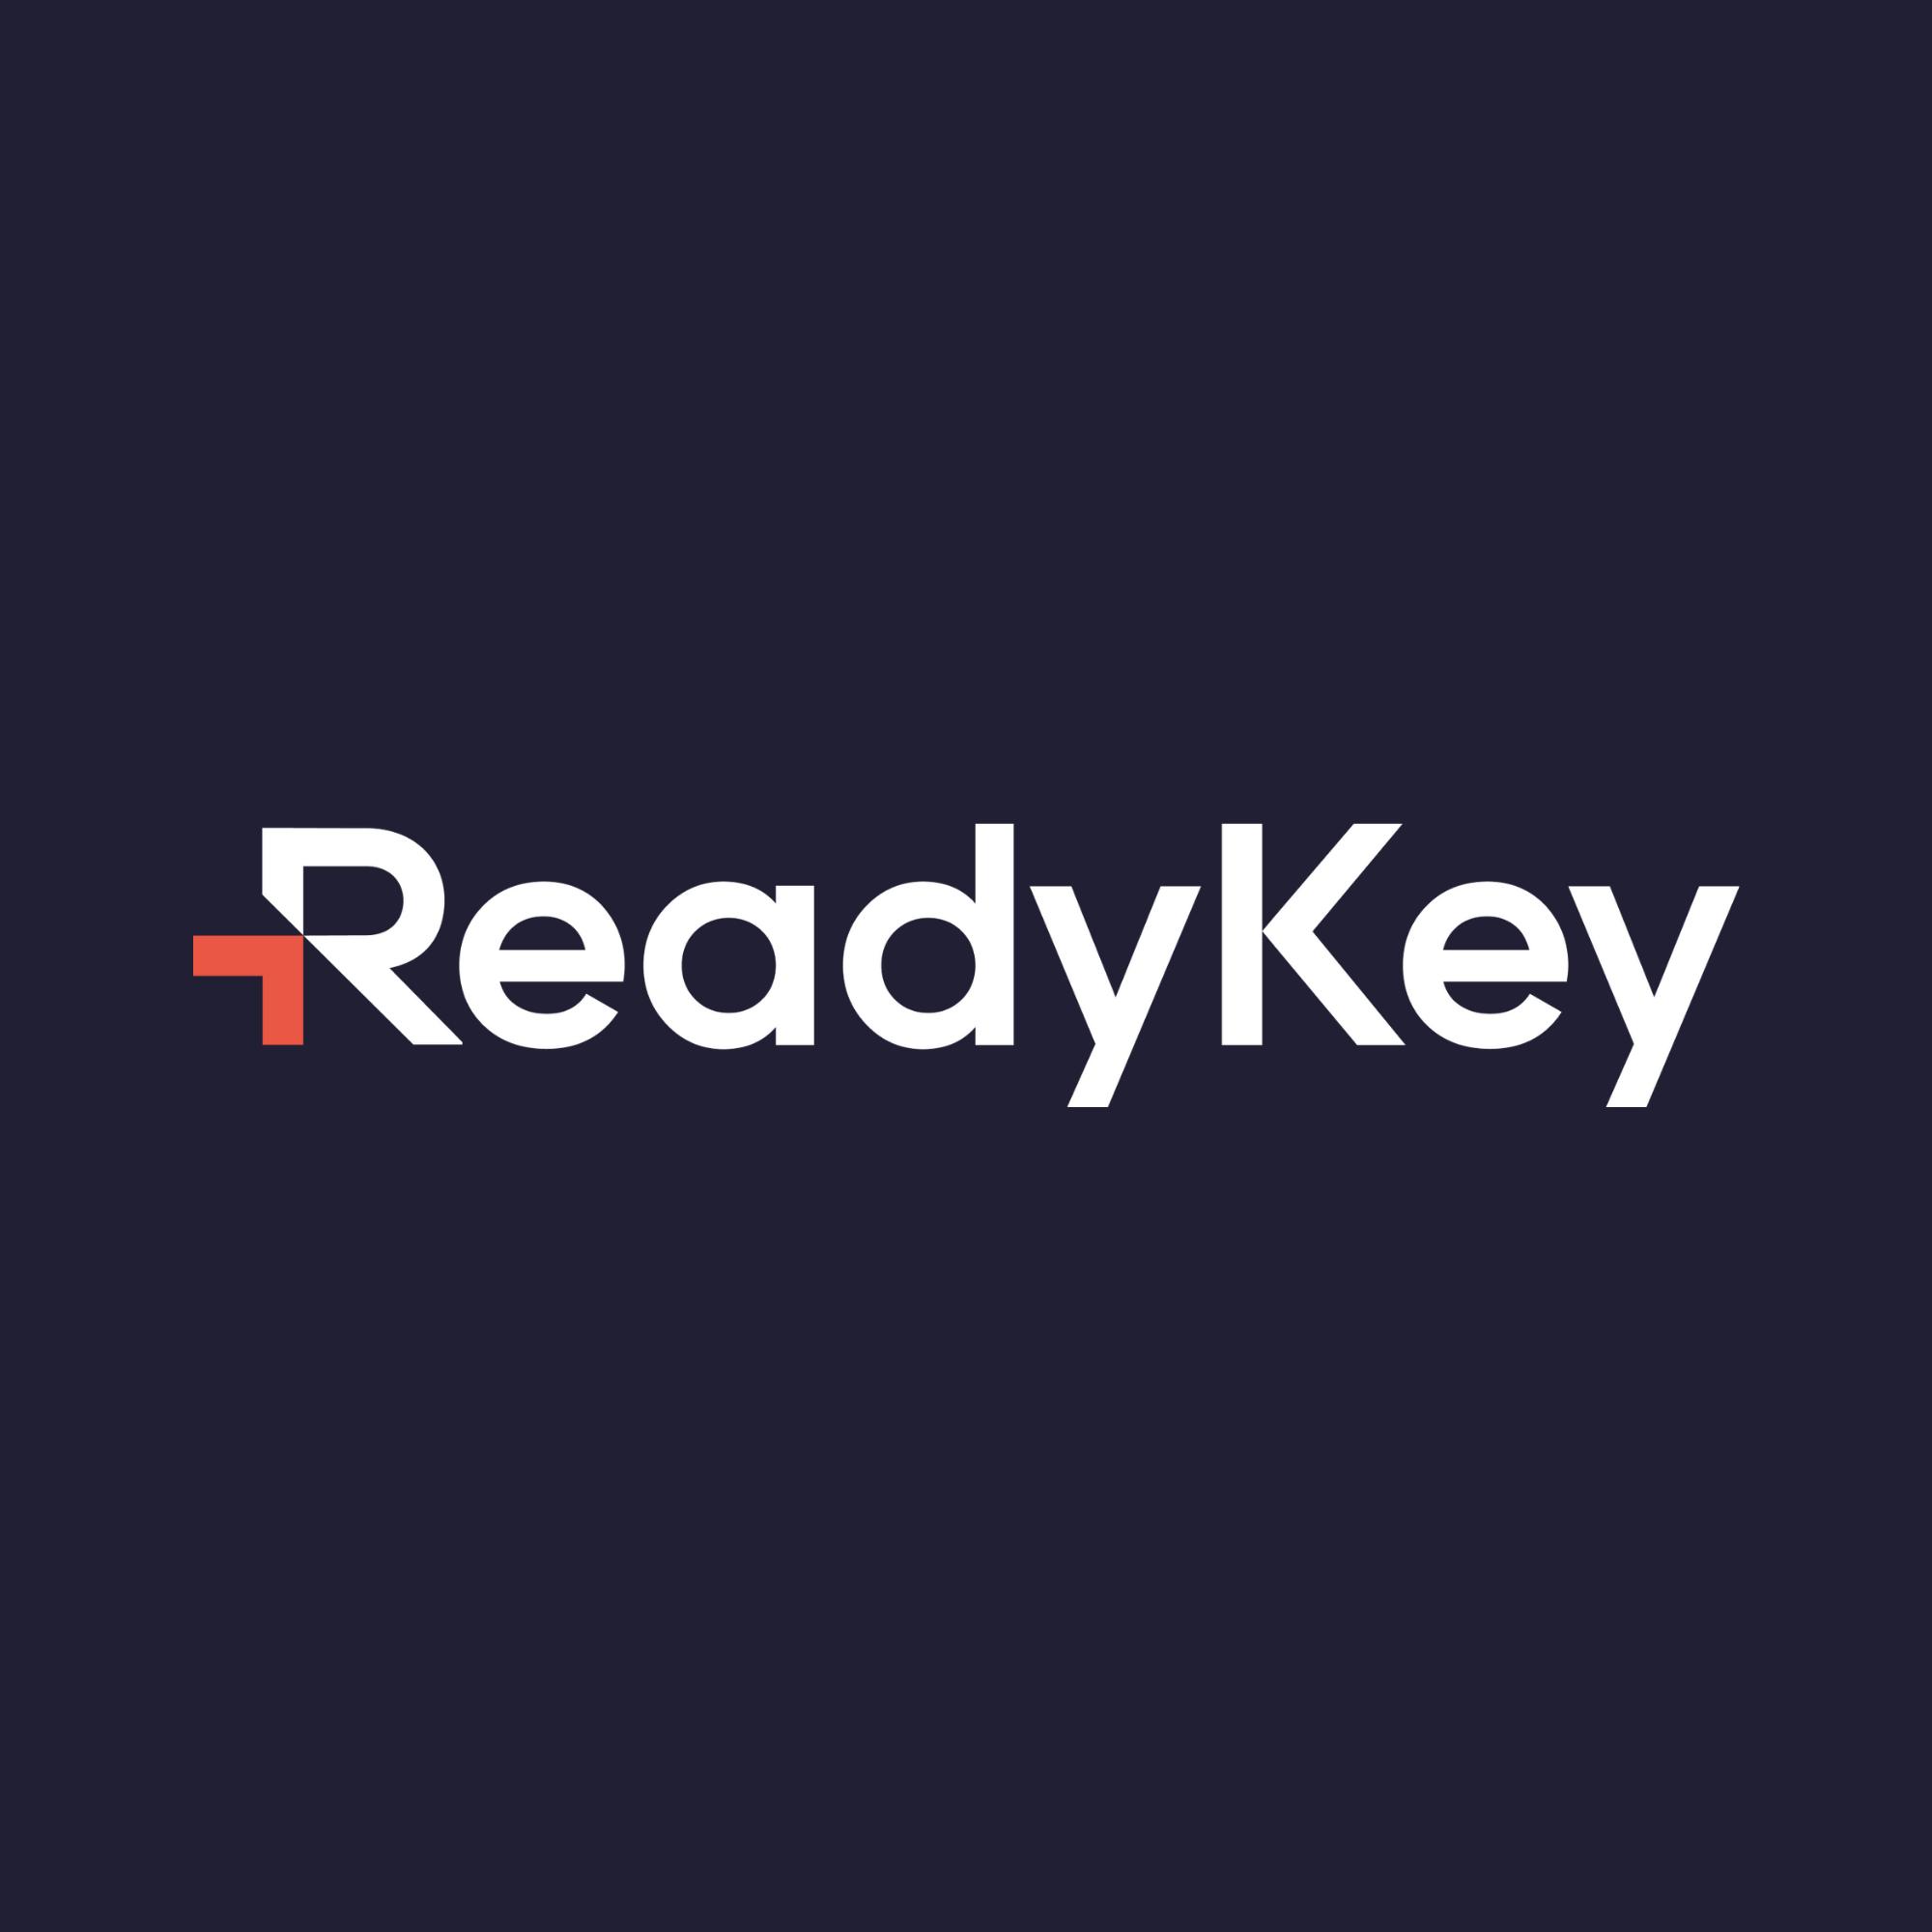 ReadyKey